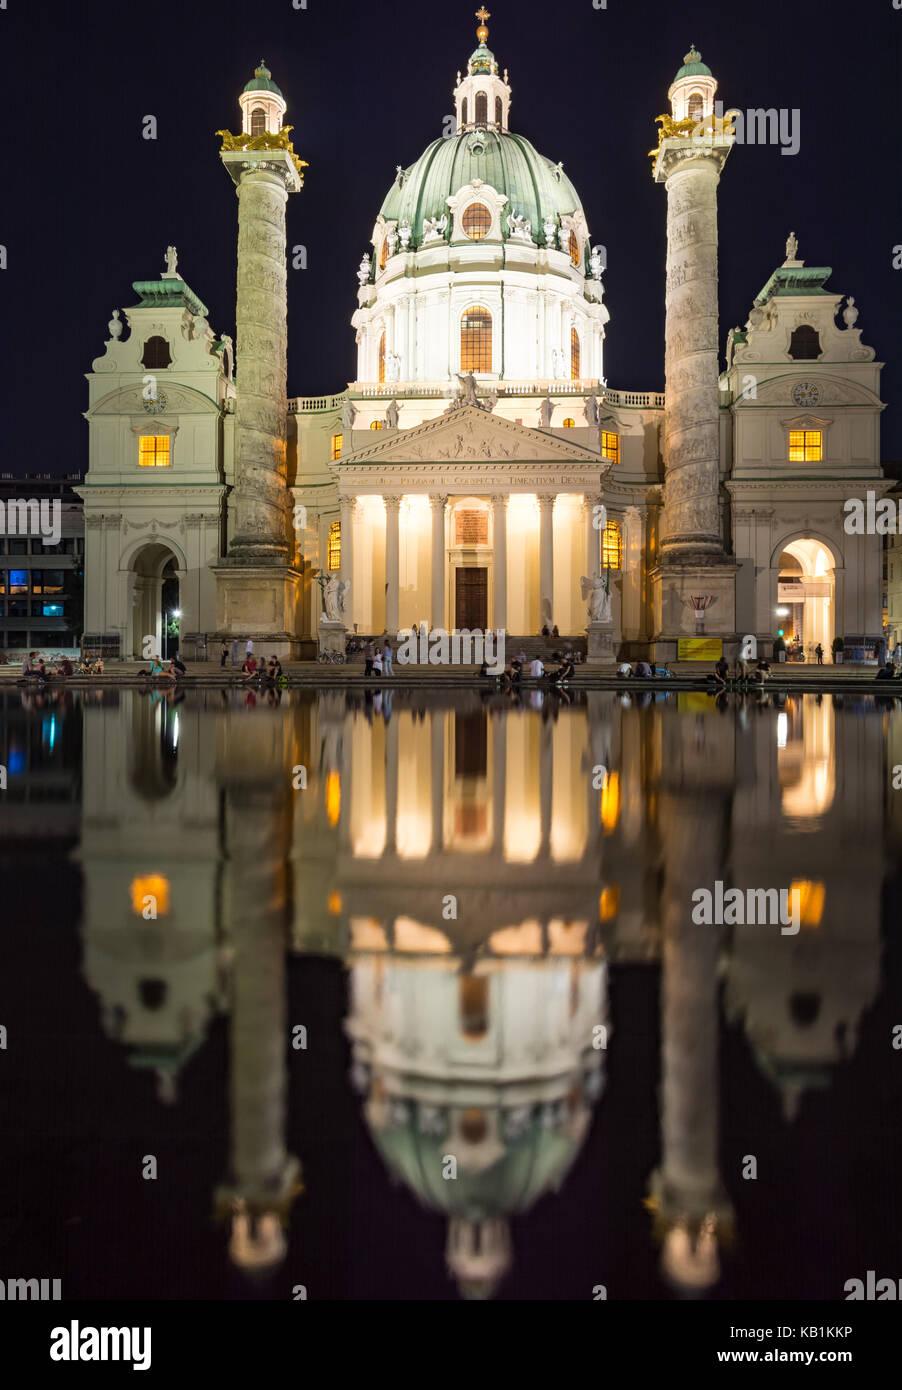 VIENNA, AUSTRIA - AUGUST 30: Tourists at the illuminated Baroque Karlskirche in Vienna, Austria on August 30, 2017. - Stock Image